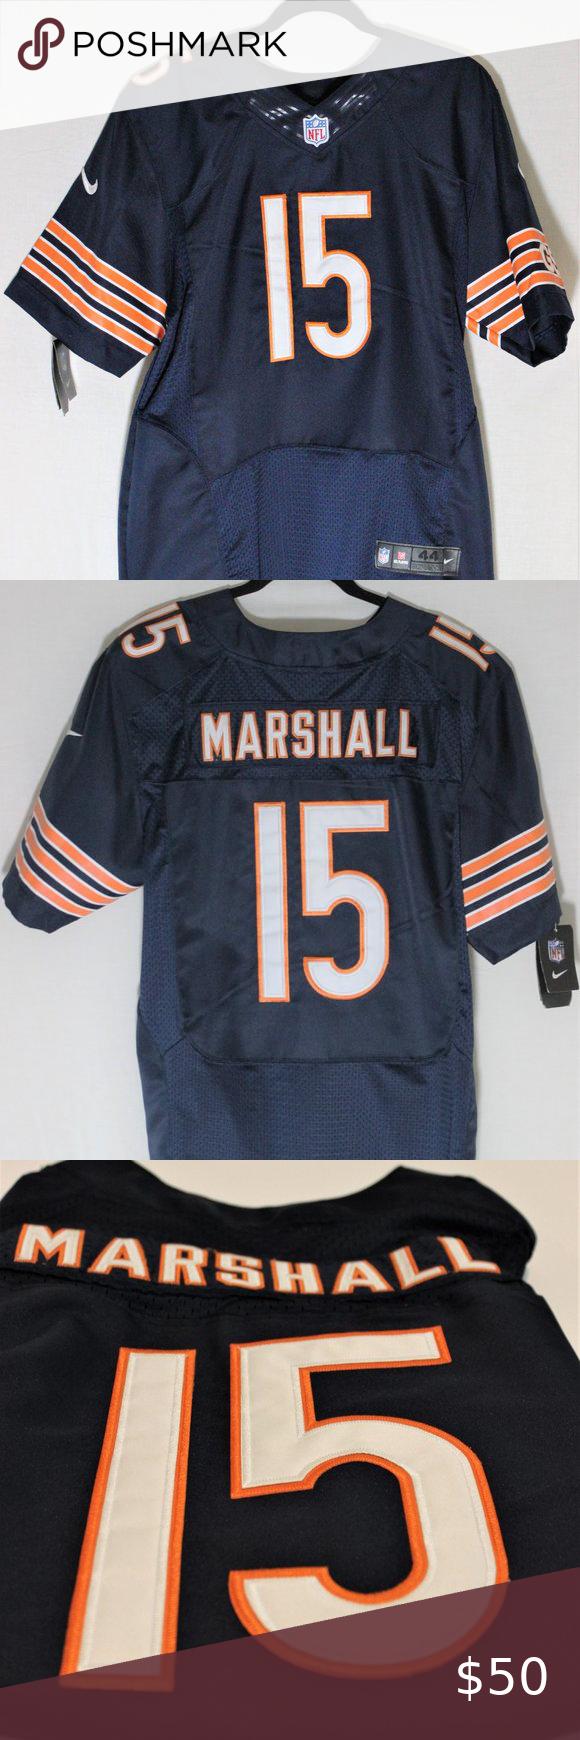 brandon marshall authentic jersey